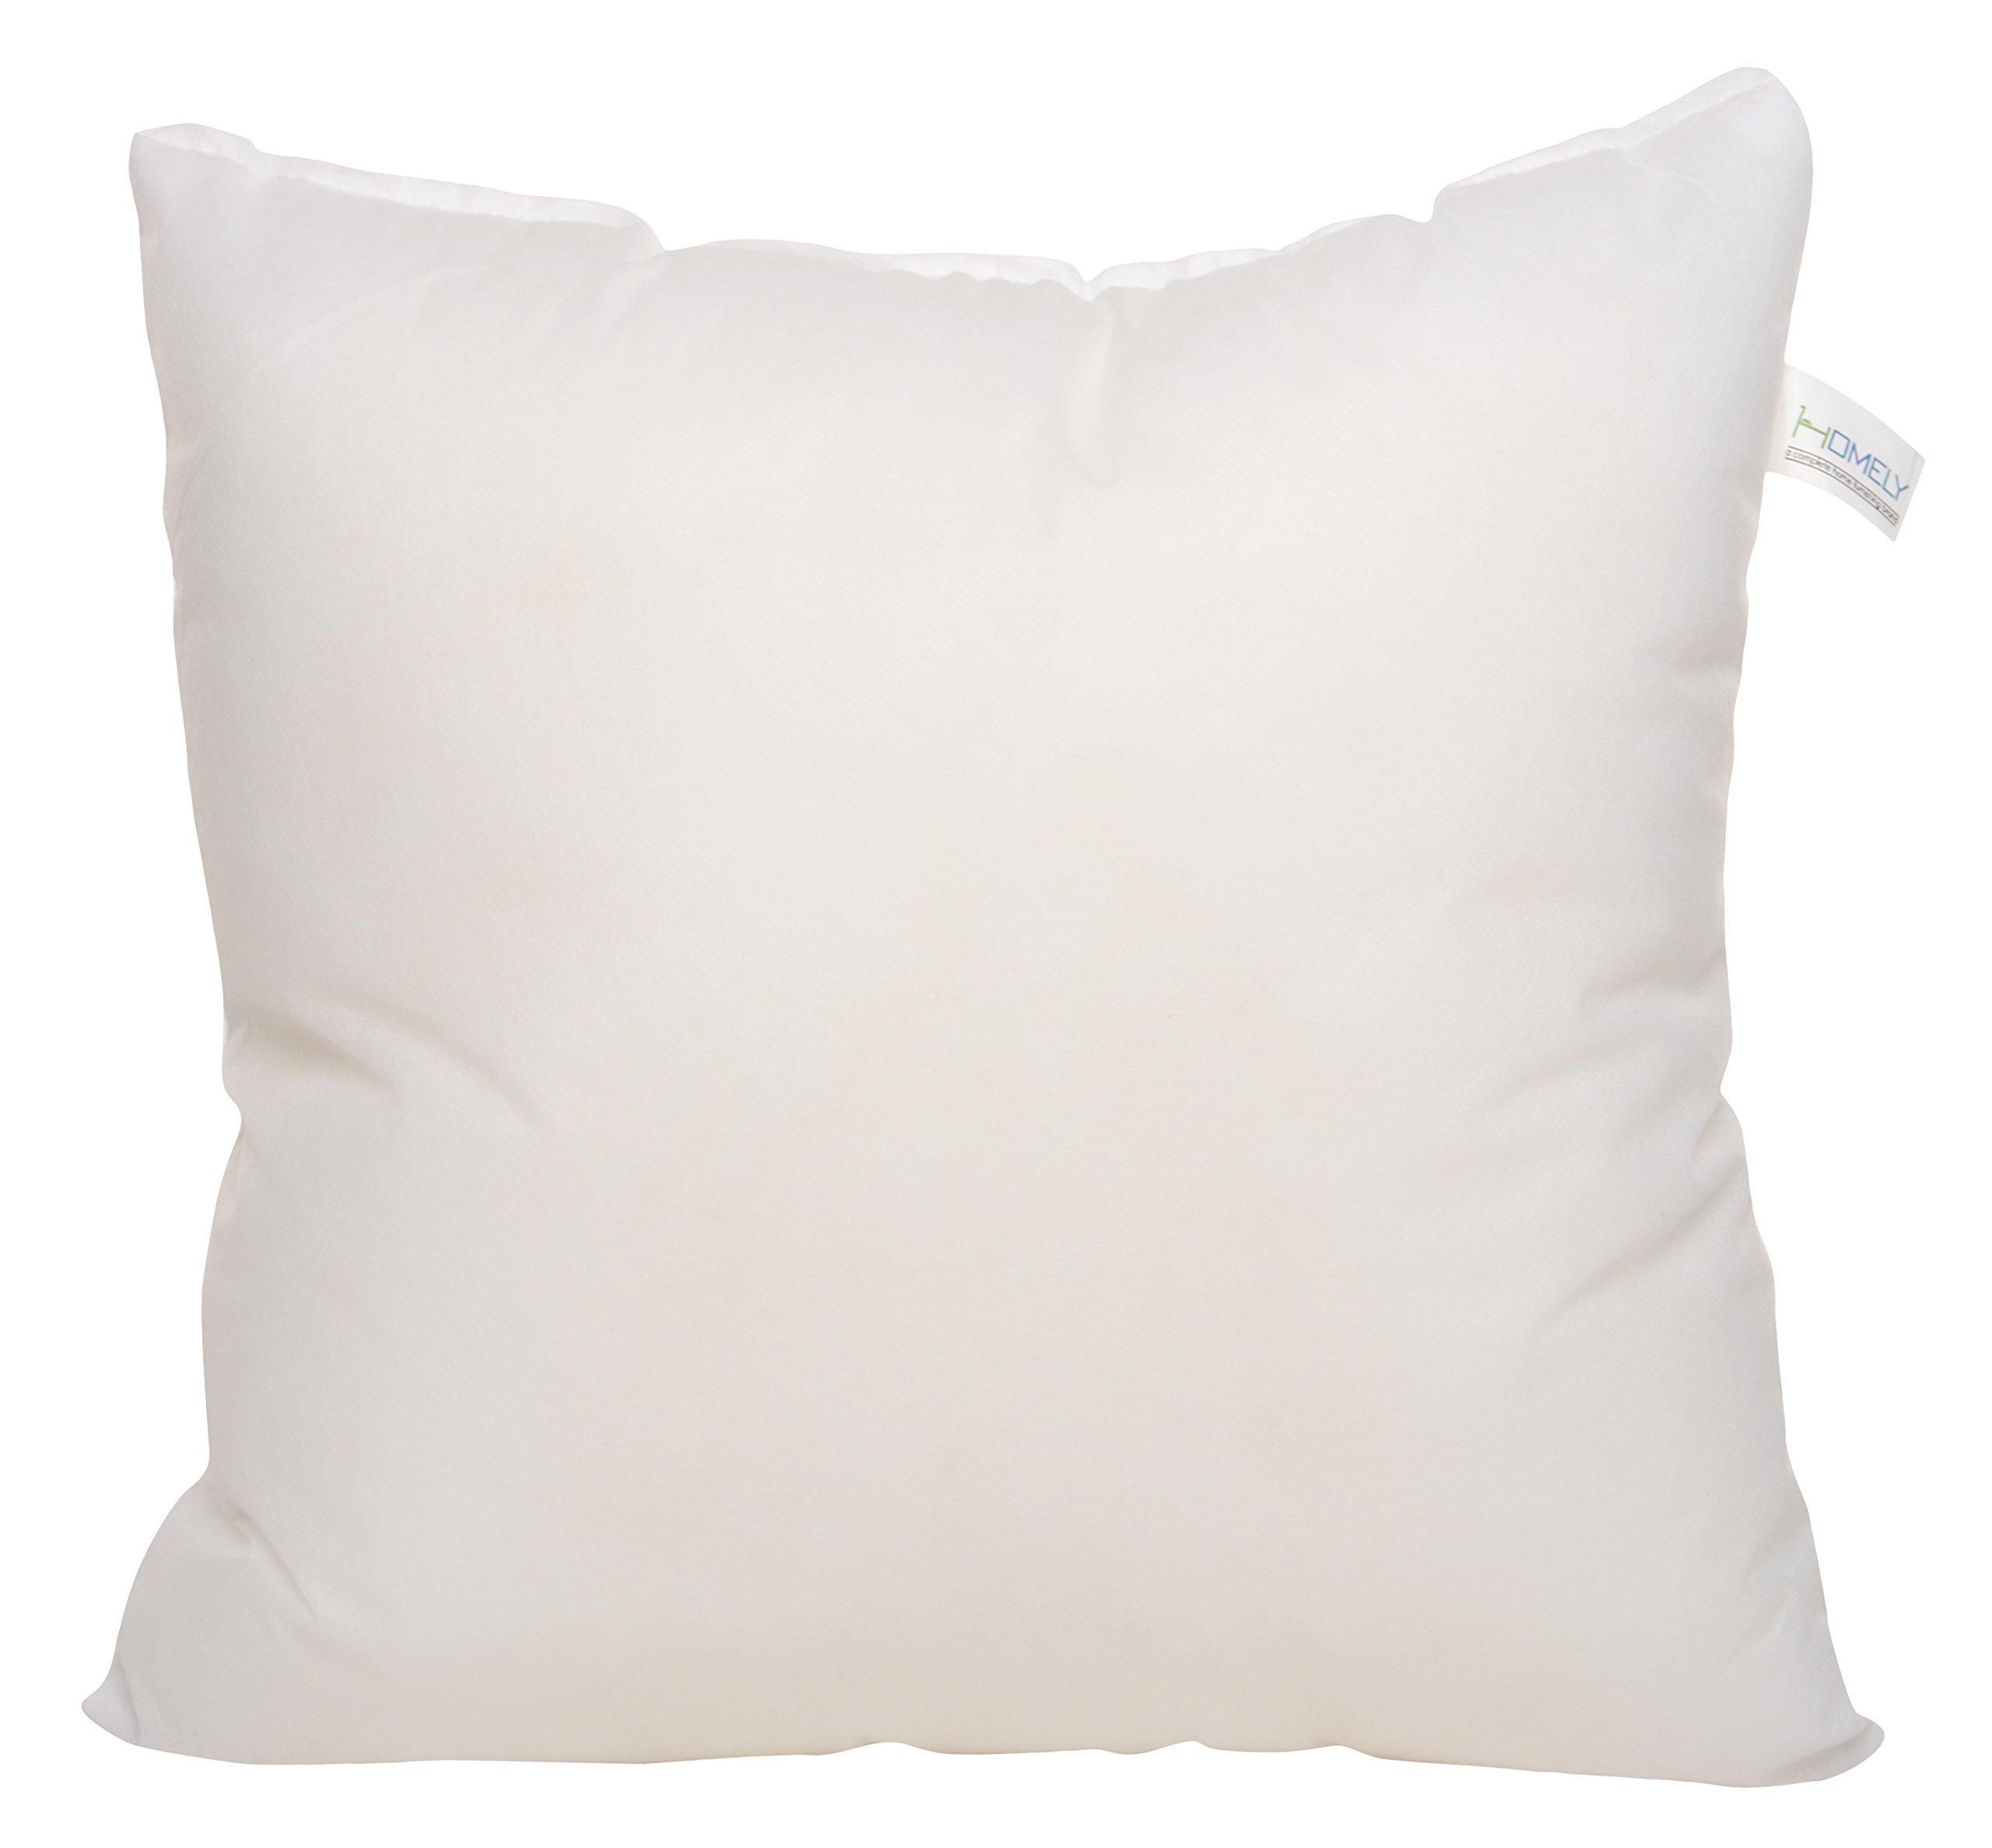 Homely Microfiber 1 Piece Cushion - 12